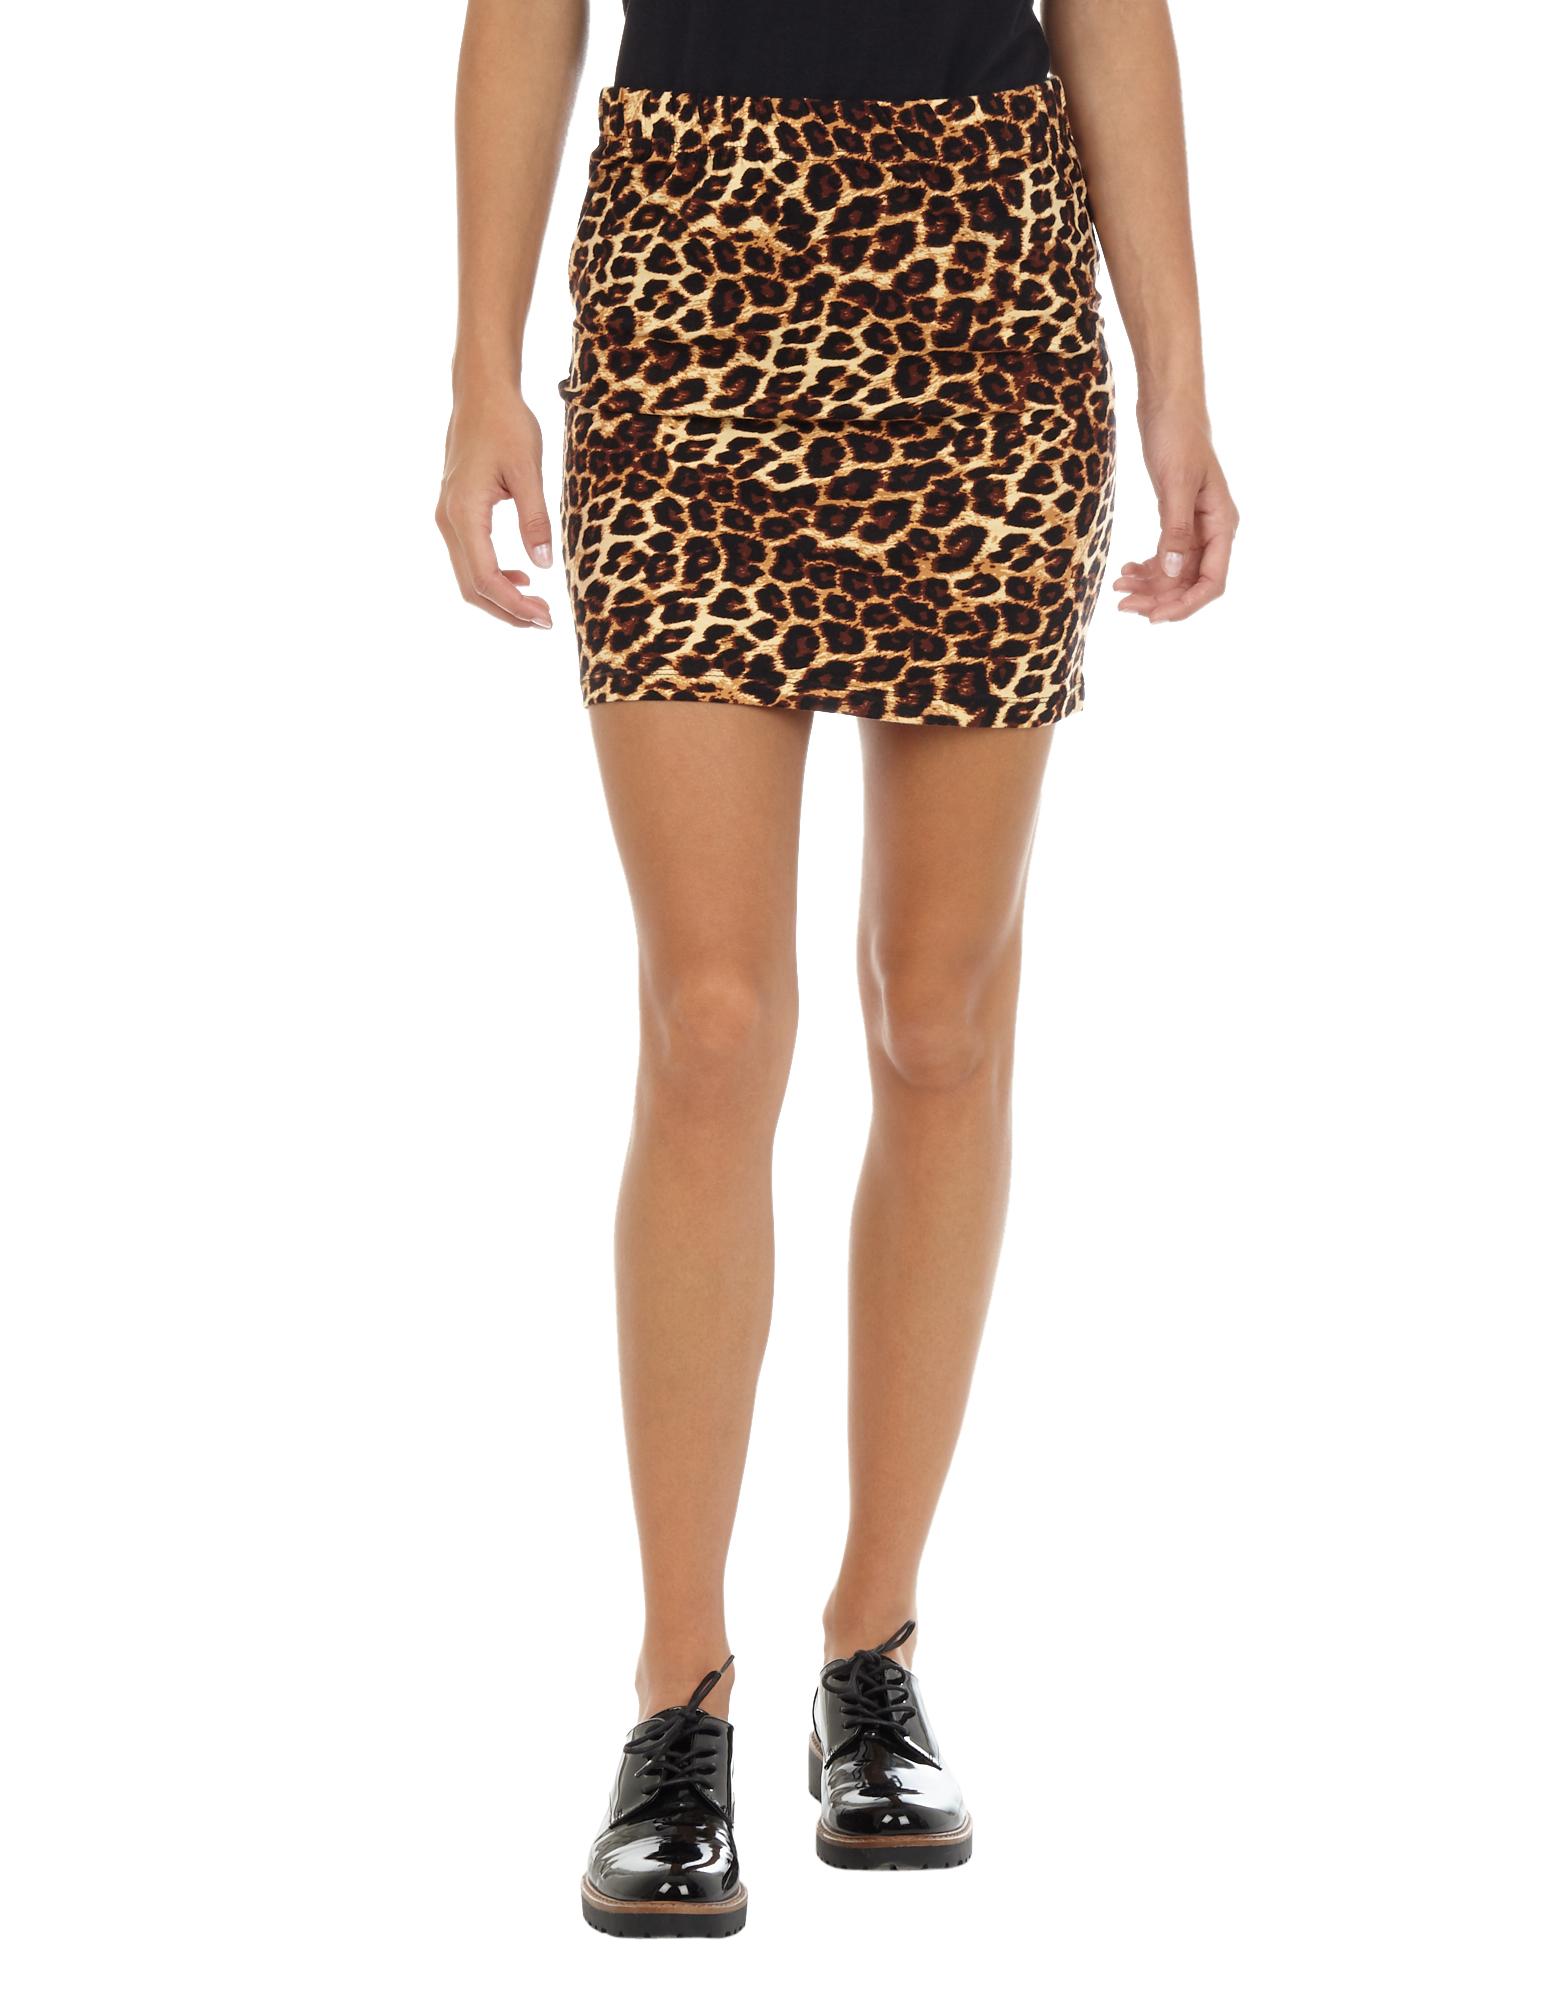 Damen Minirock mit Leopardenmuster leopard | 81550708220200